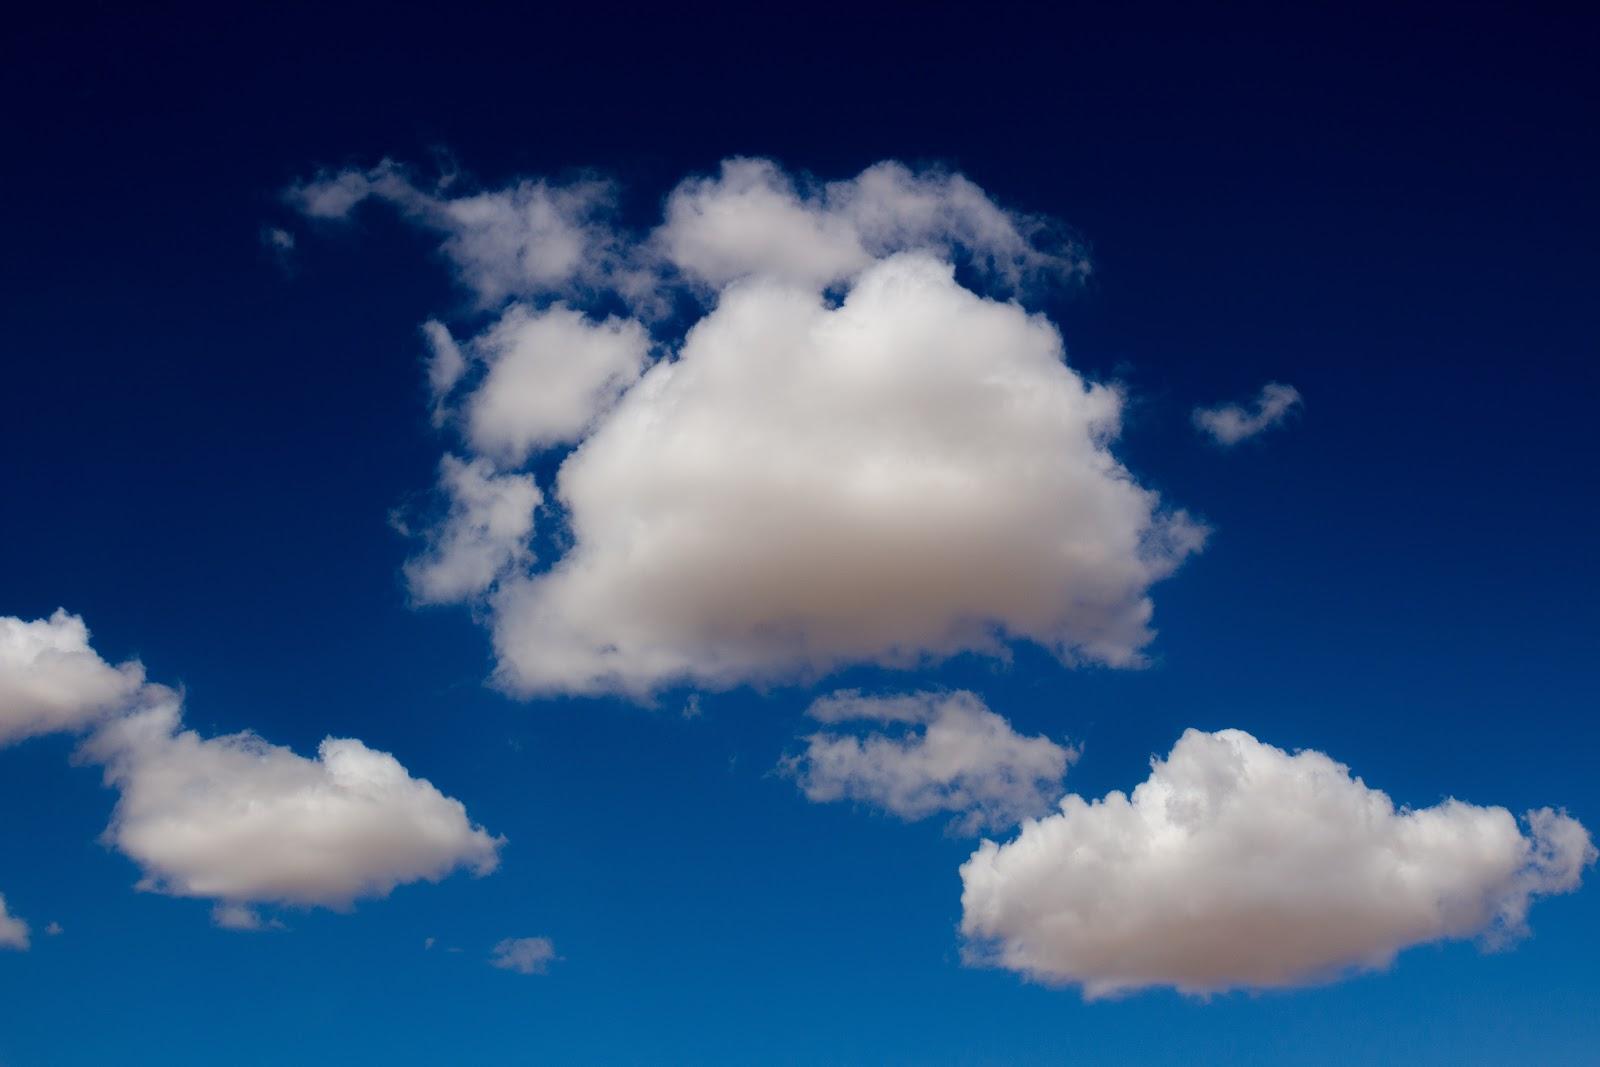 a few white clouds in front of a dark blue sky